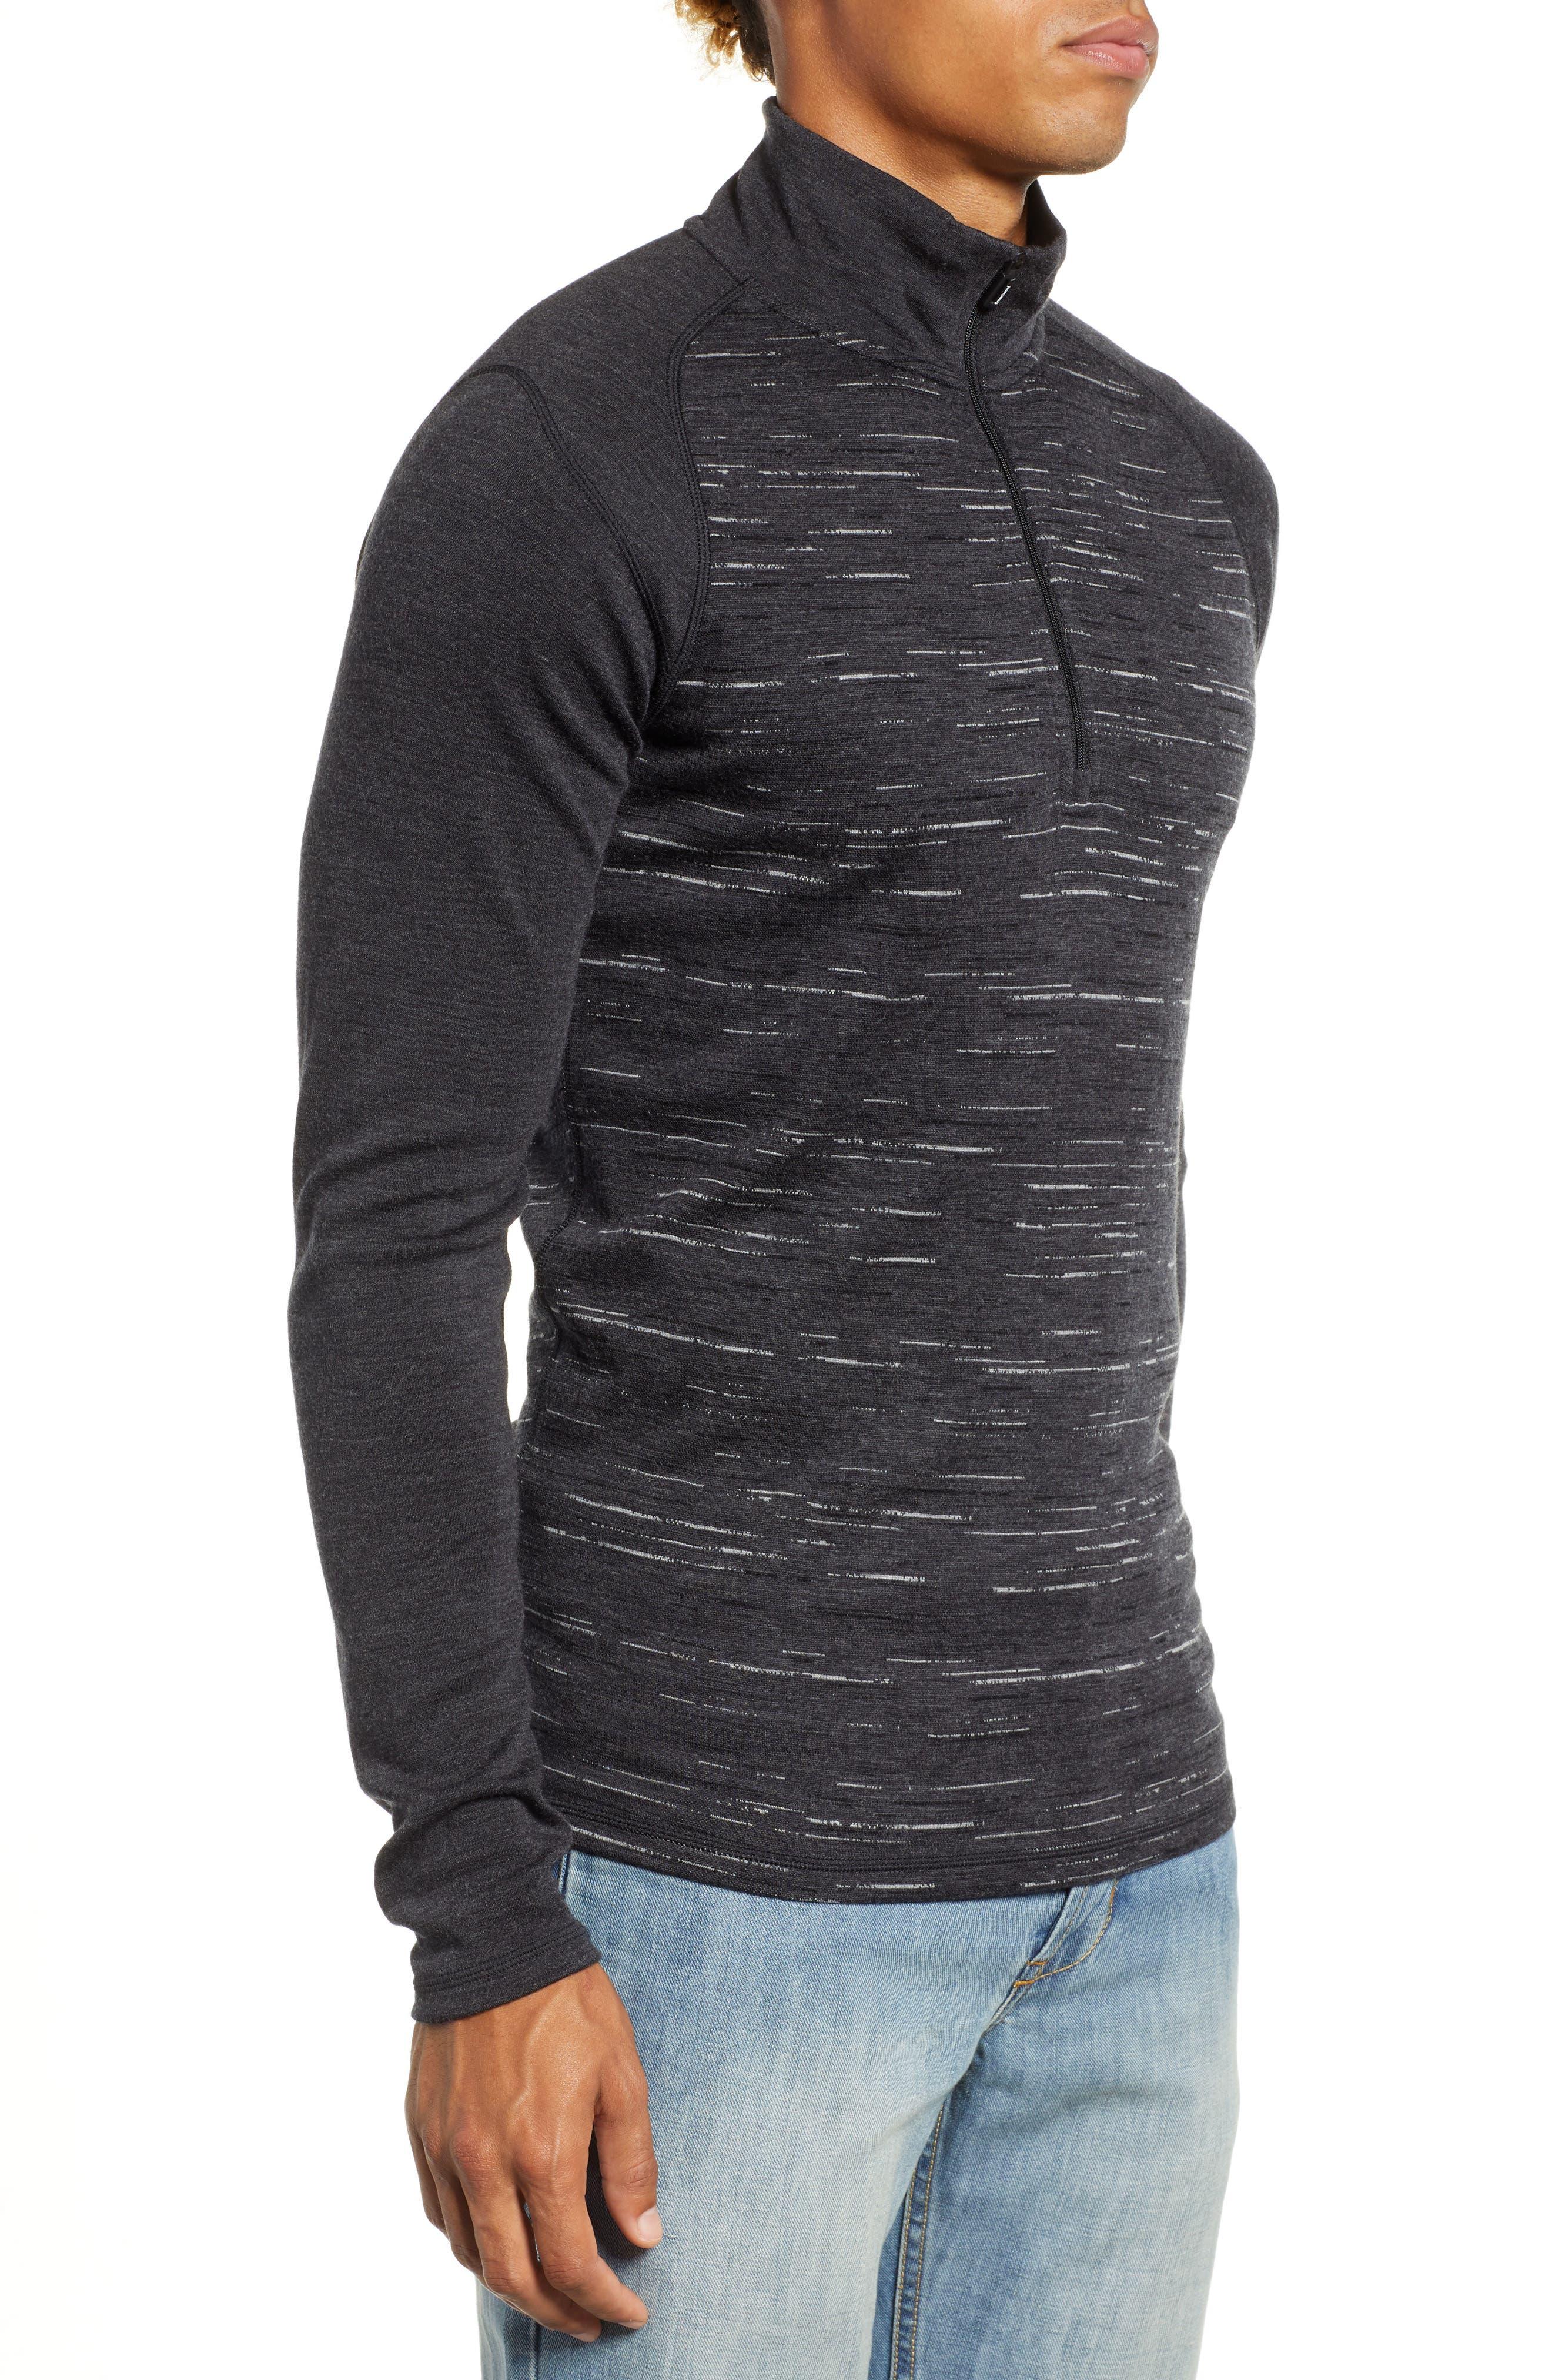 SMARTWOOL,                             Merino 250 Base Layer Pattern Quarter Zip Pullover,                             Alternate thumbnail 3, color,                             CHARCOAL/ BLACK